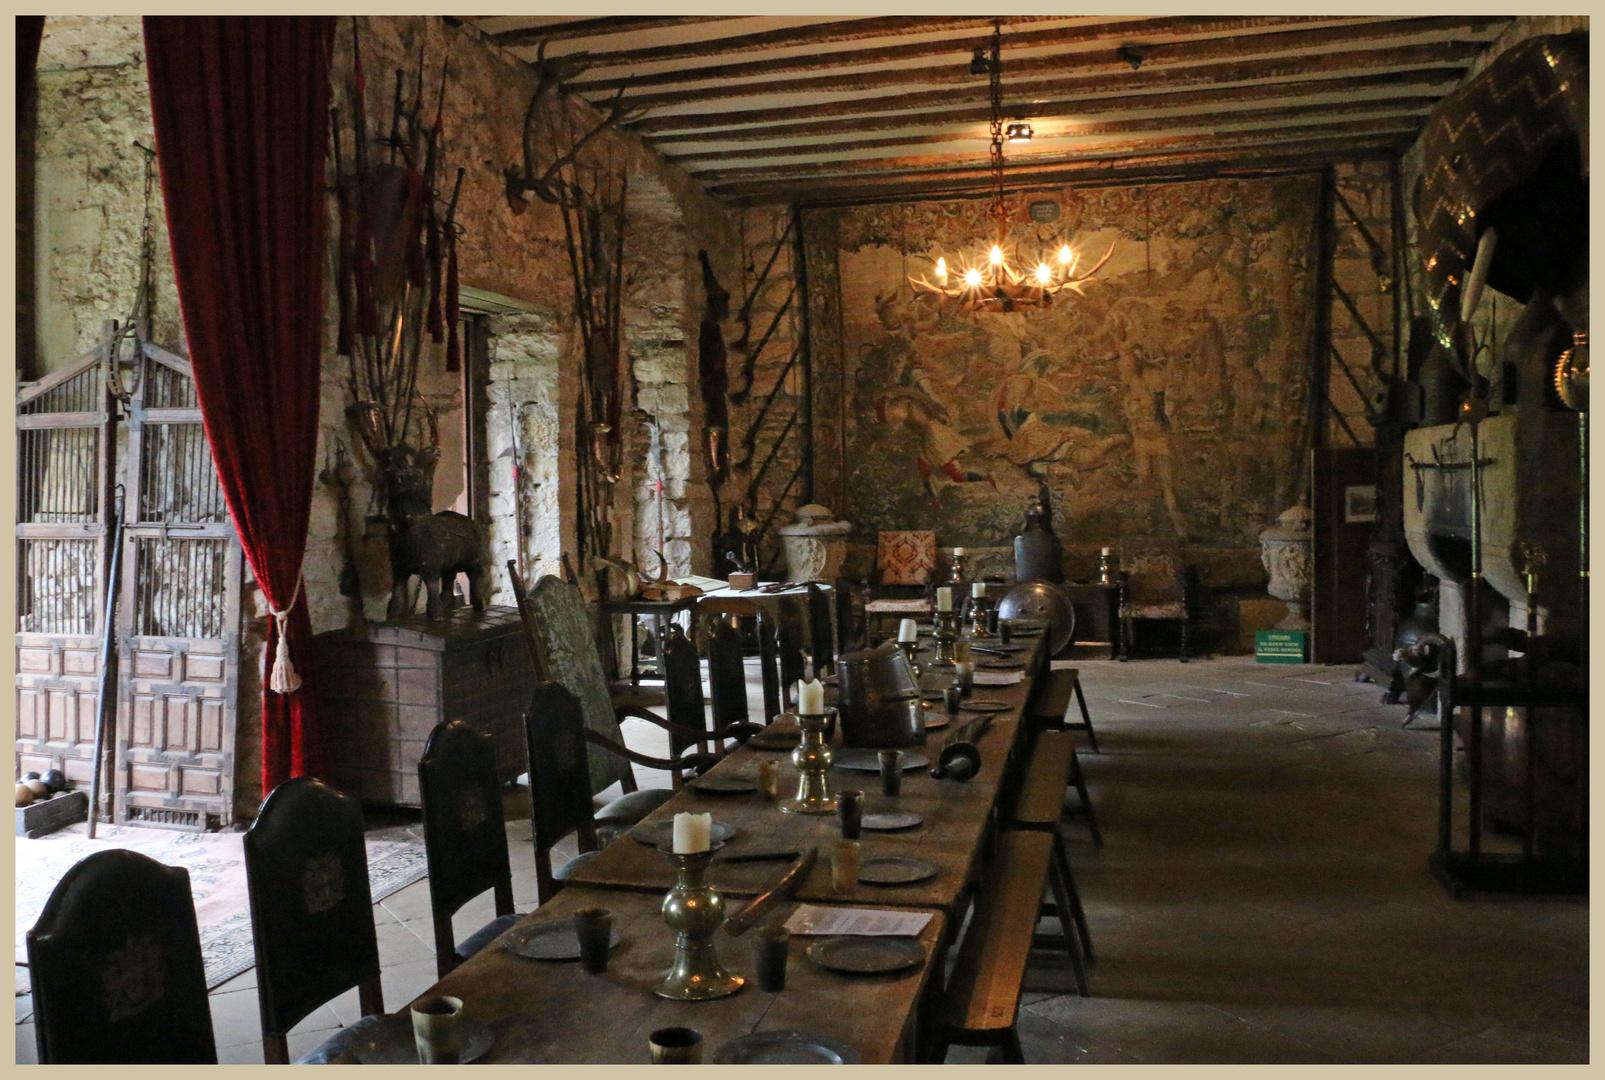 chillingham castle the main hall